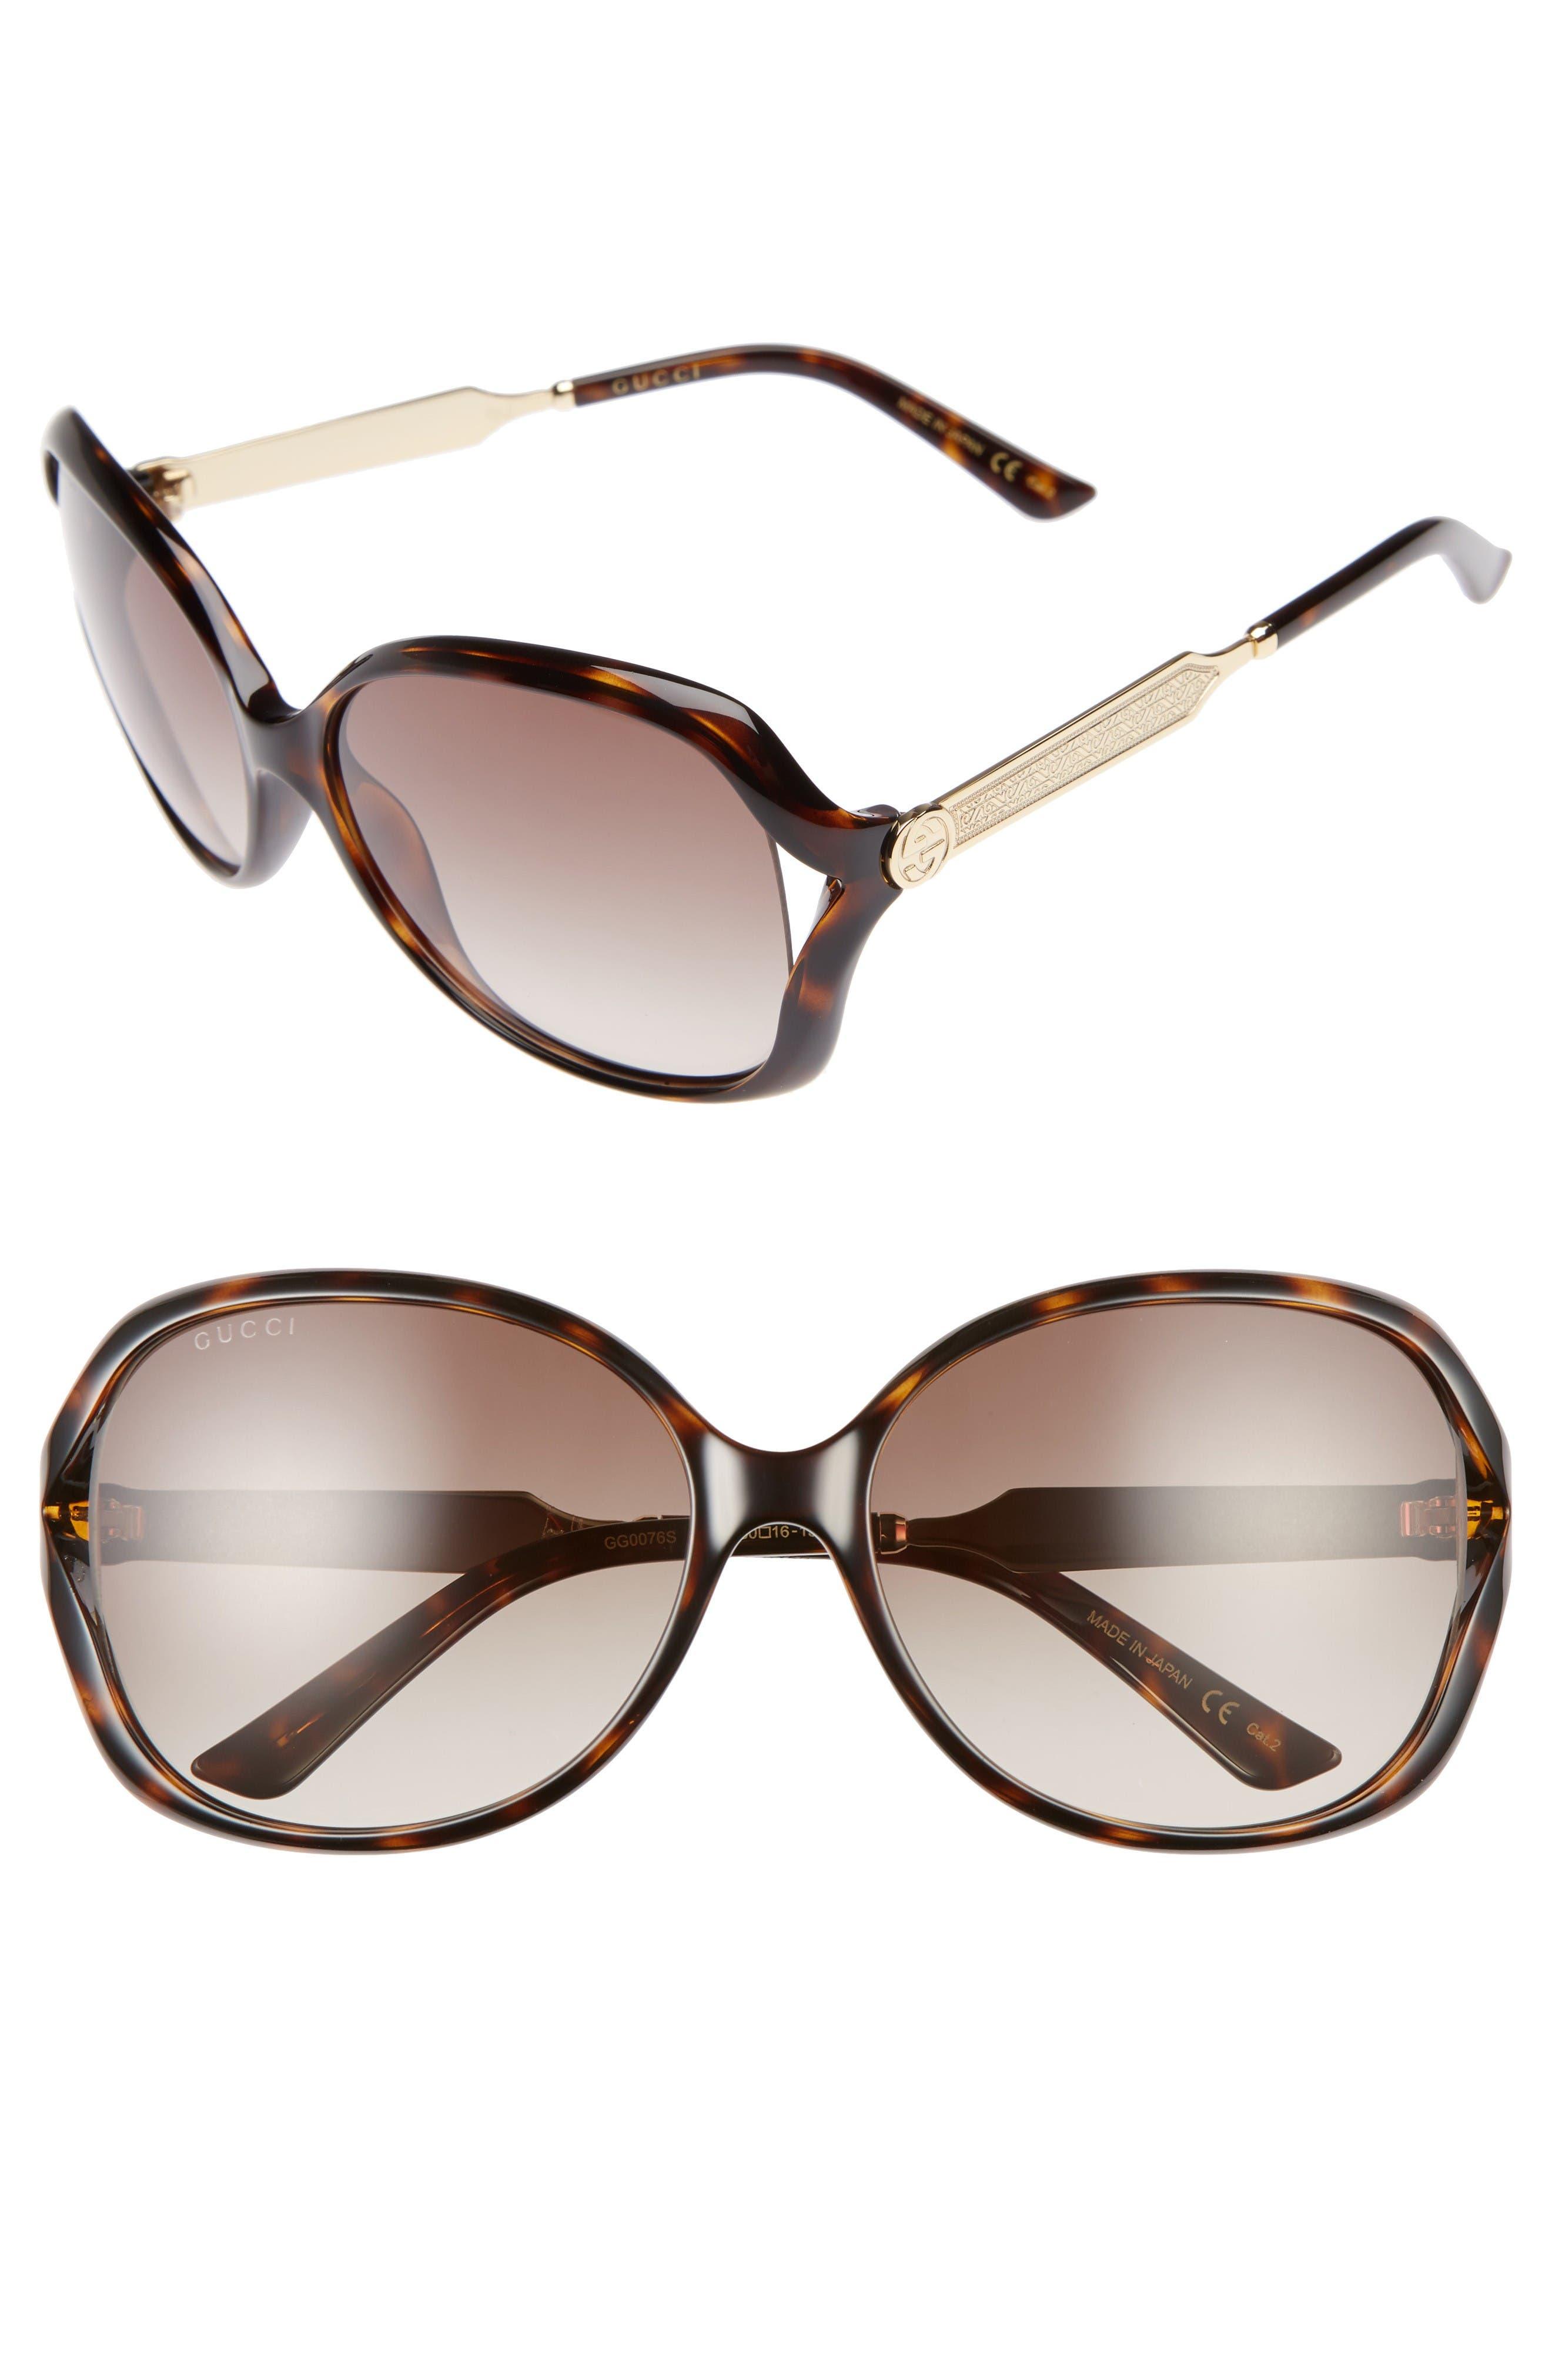 60mm Open Temple Oval Sunglasses,                         Main,                         color, Havana/ Brown